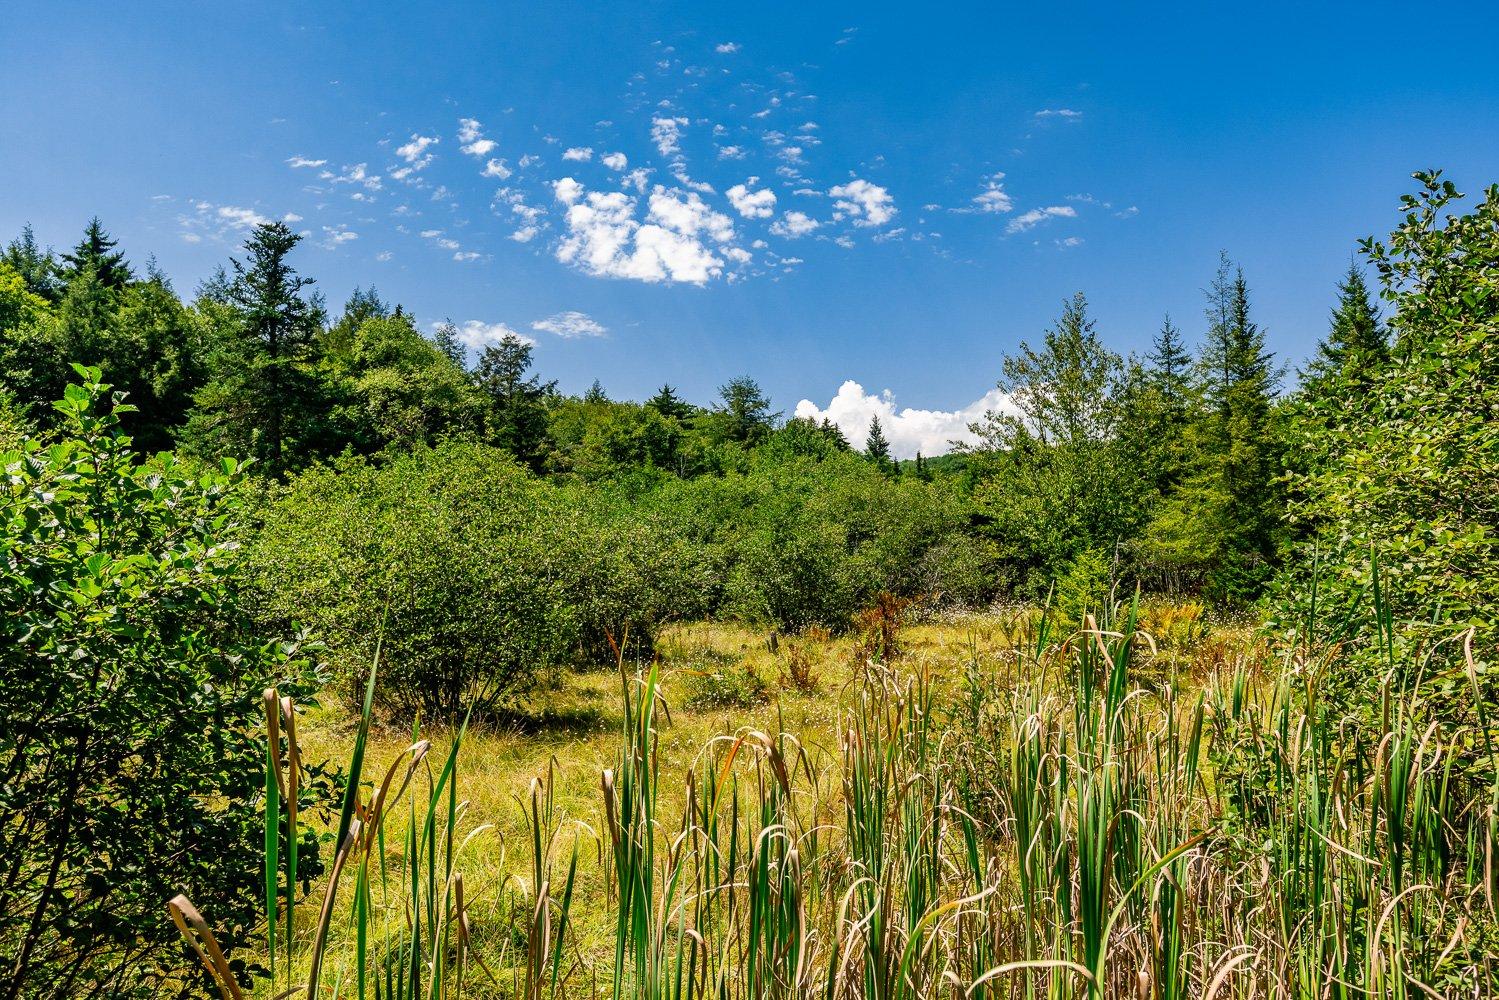 WV Natural Areas: Canaan Valley Wetland